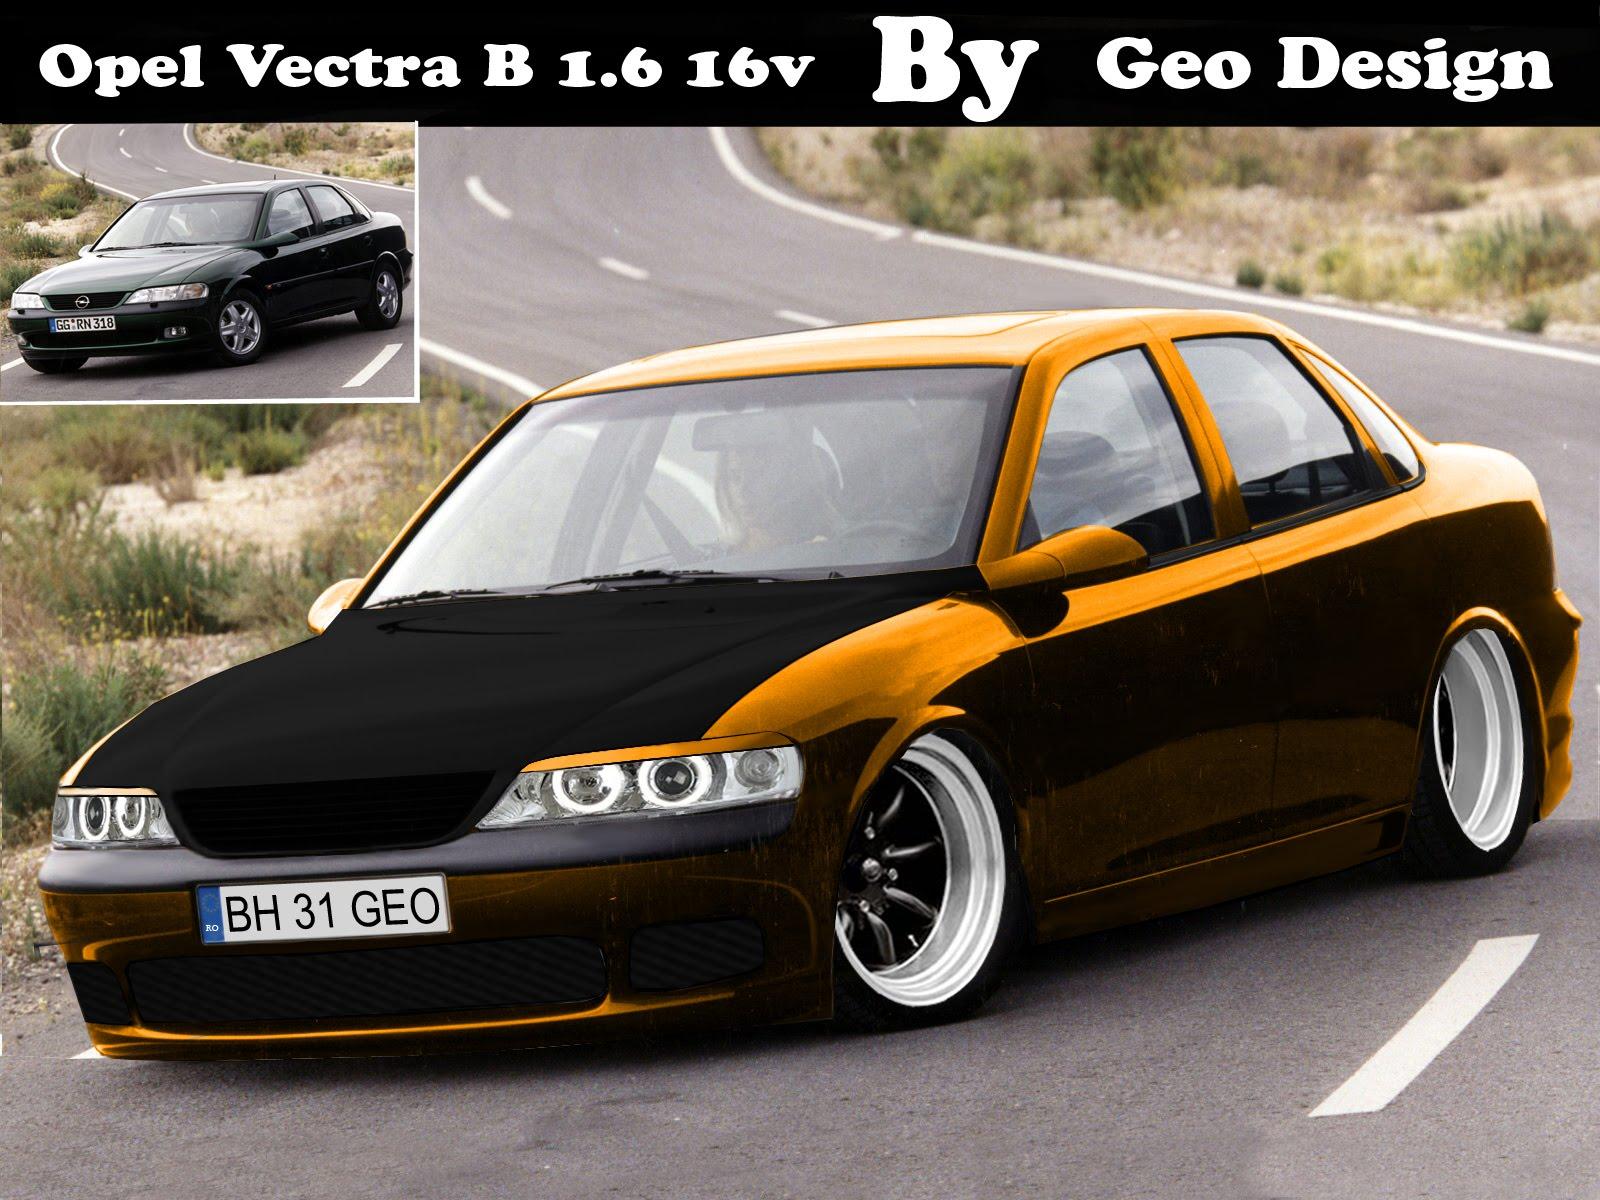 geo designs opel vectra b by geo. Black Bedroom Furniture Sets. Home Design Ideas